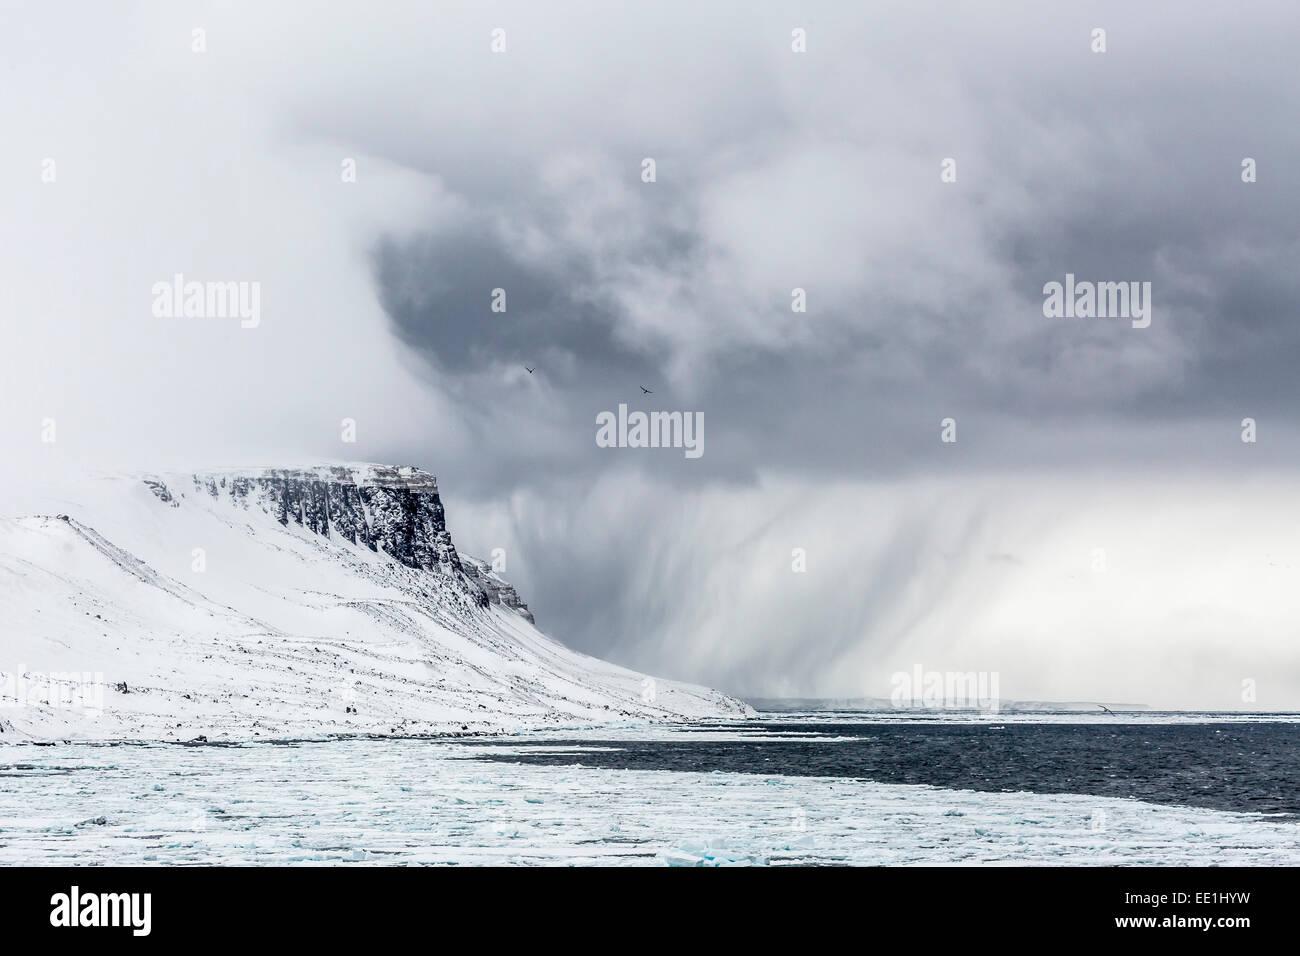 Tormenta de nieve acercando Alkefjelet, Cabo Fanshawe, Spitsbergen, Svalbard, ártico, Noruega, Escandinavia, Imagen De Stock